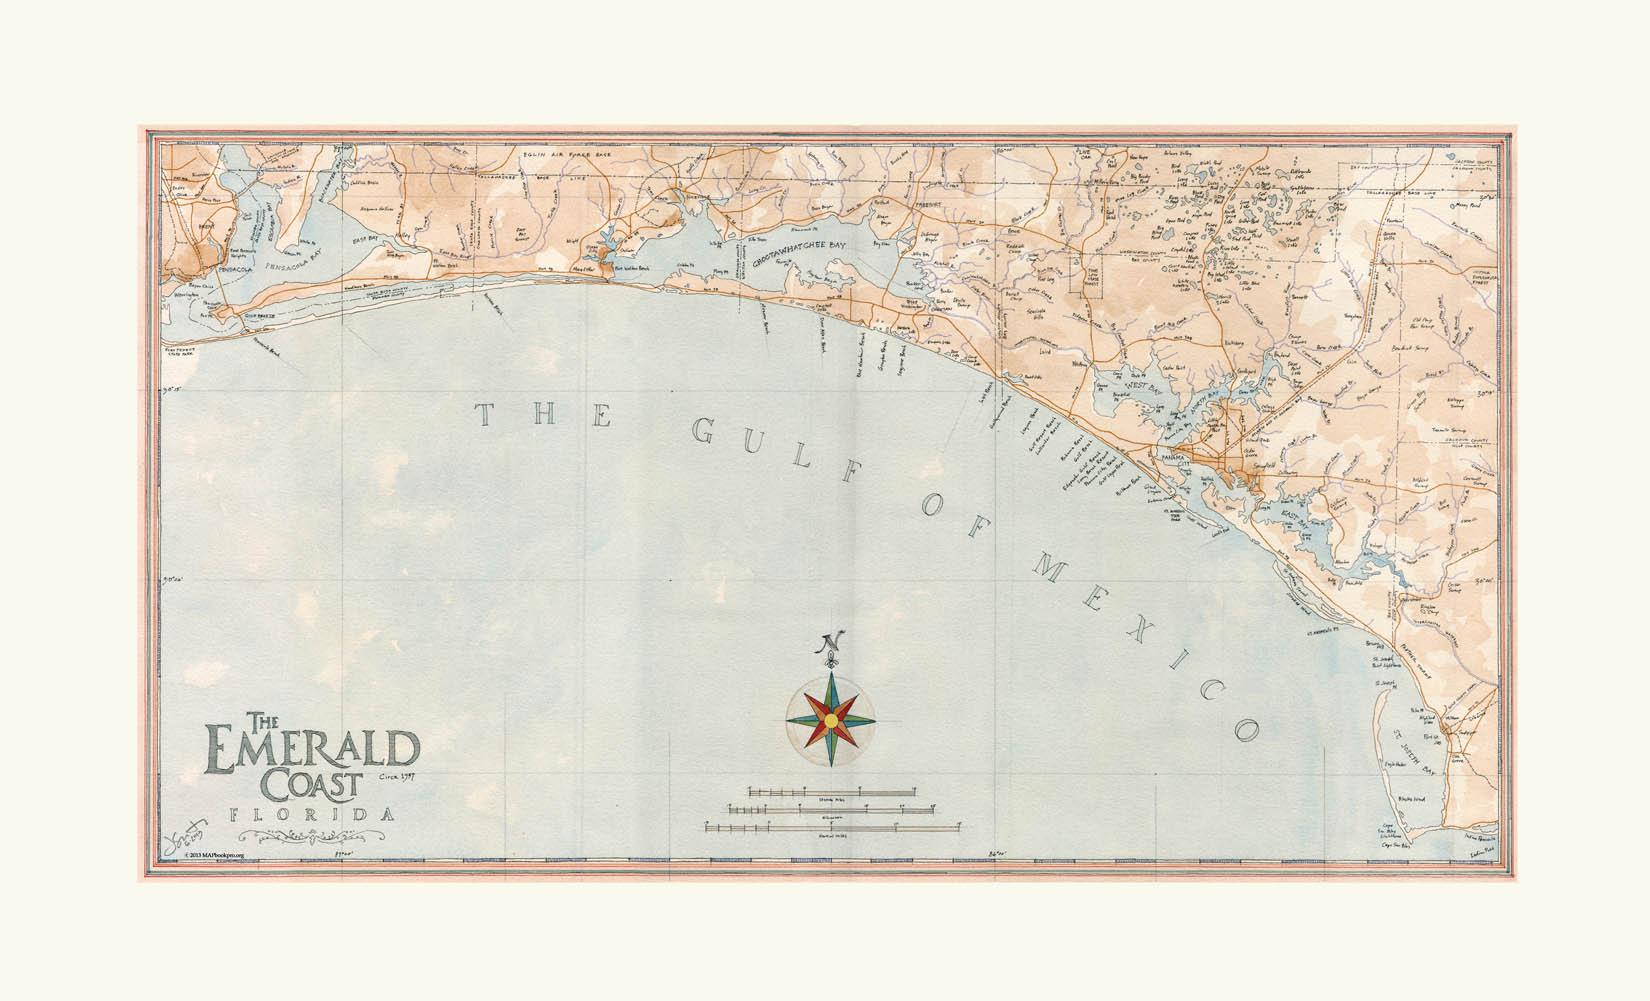 Floridas's Emerald Coast